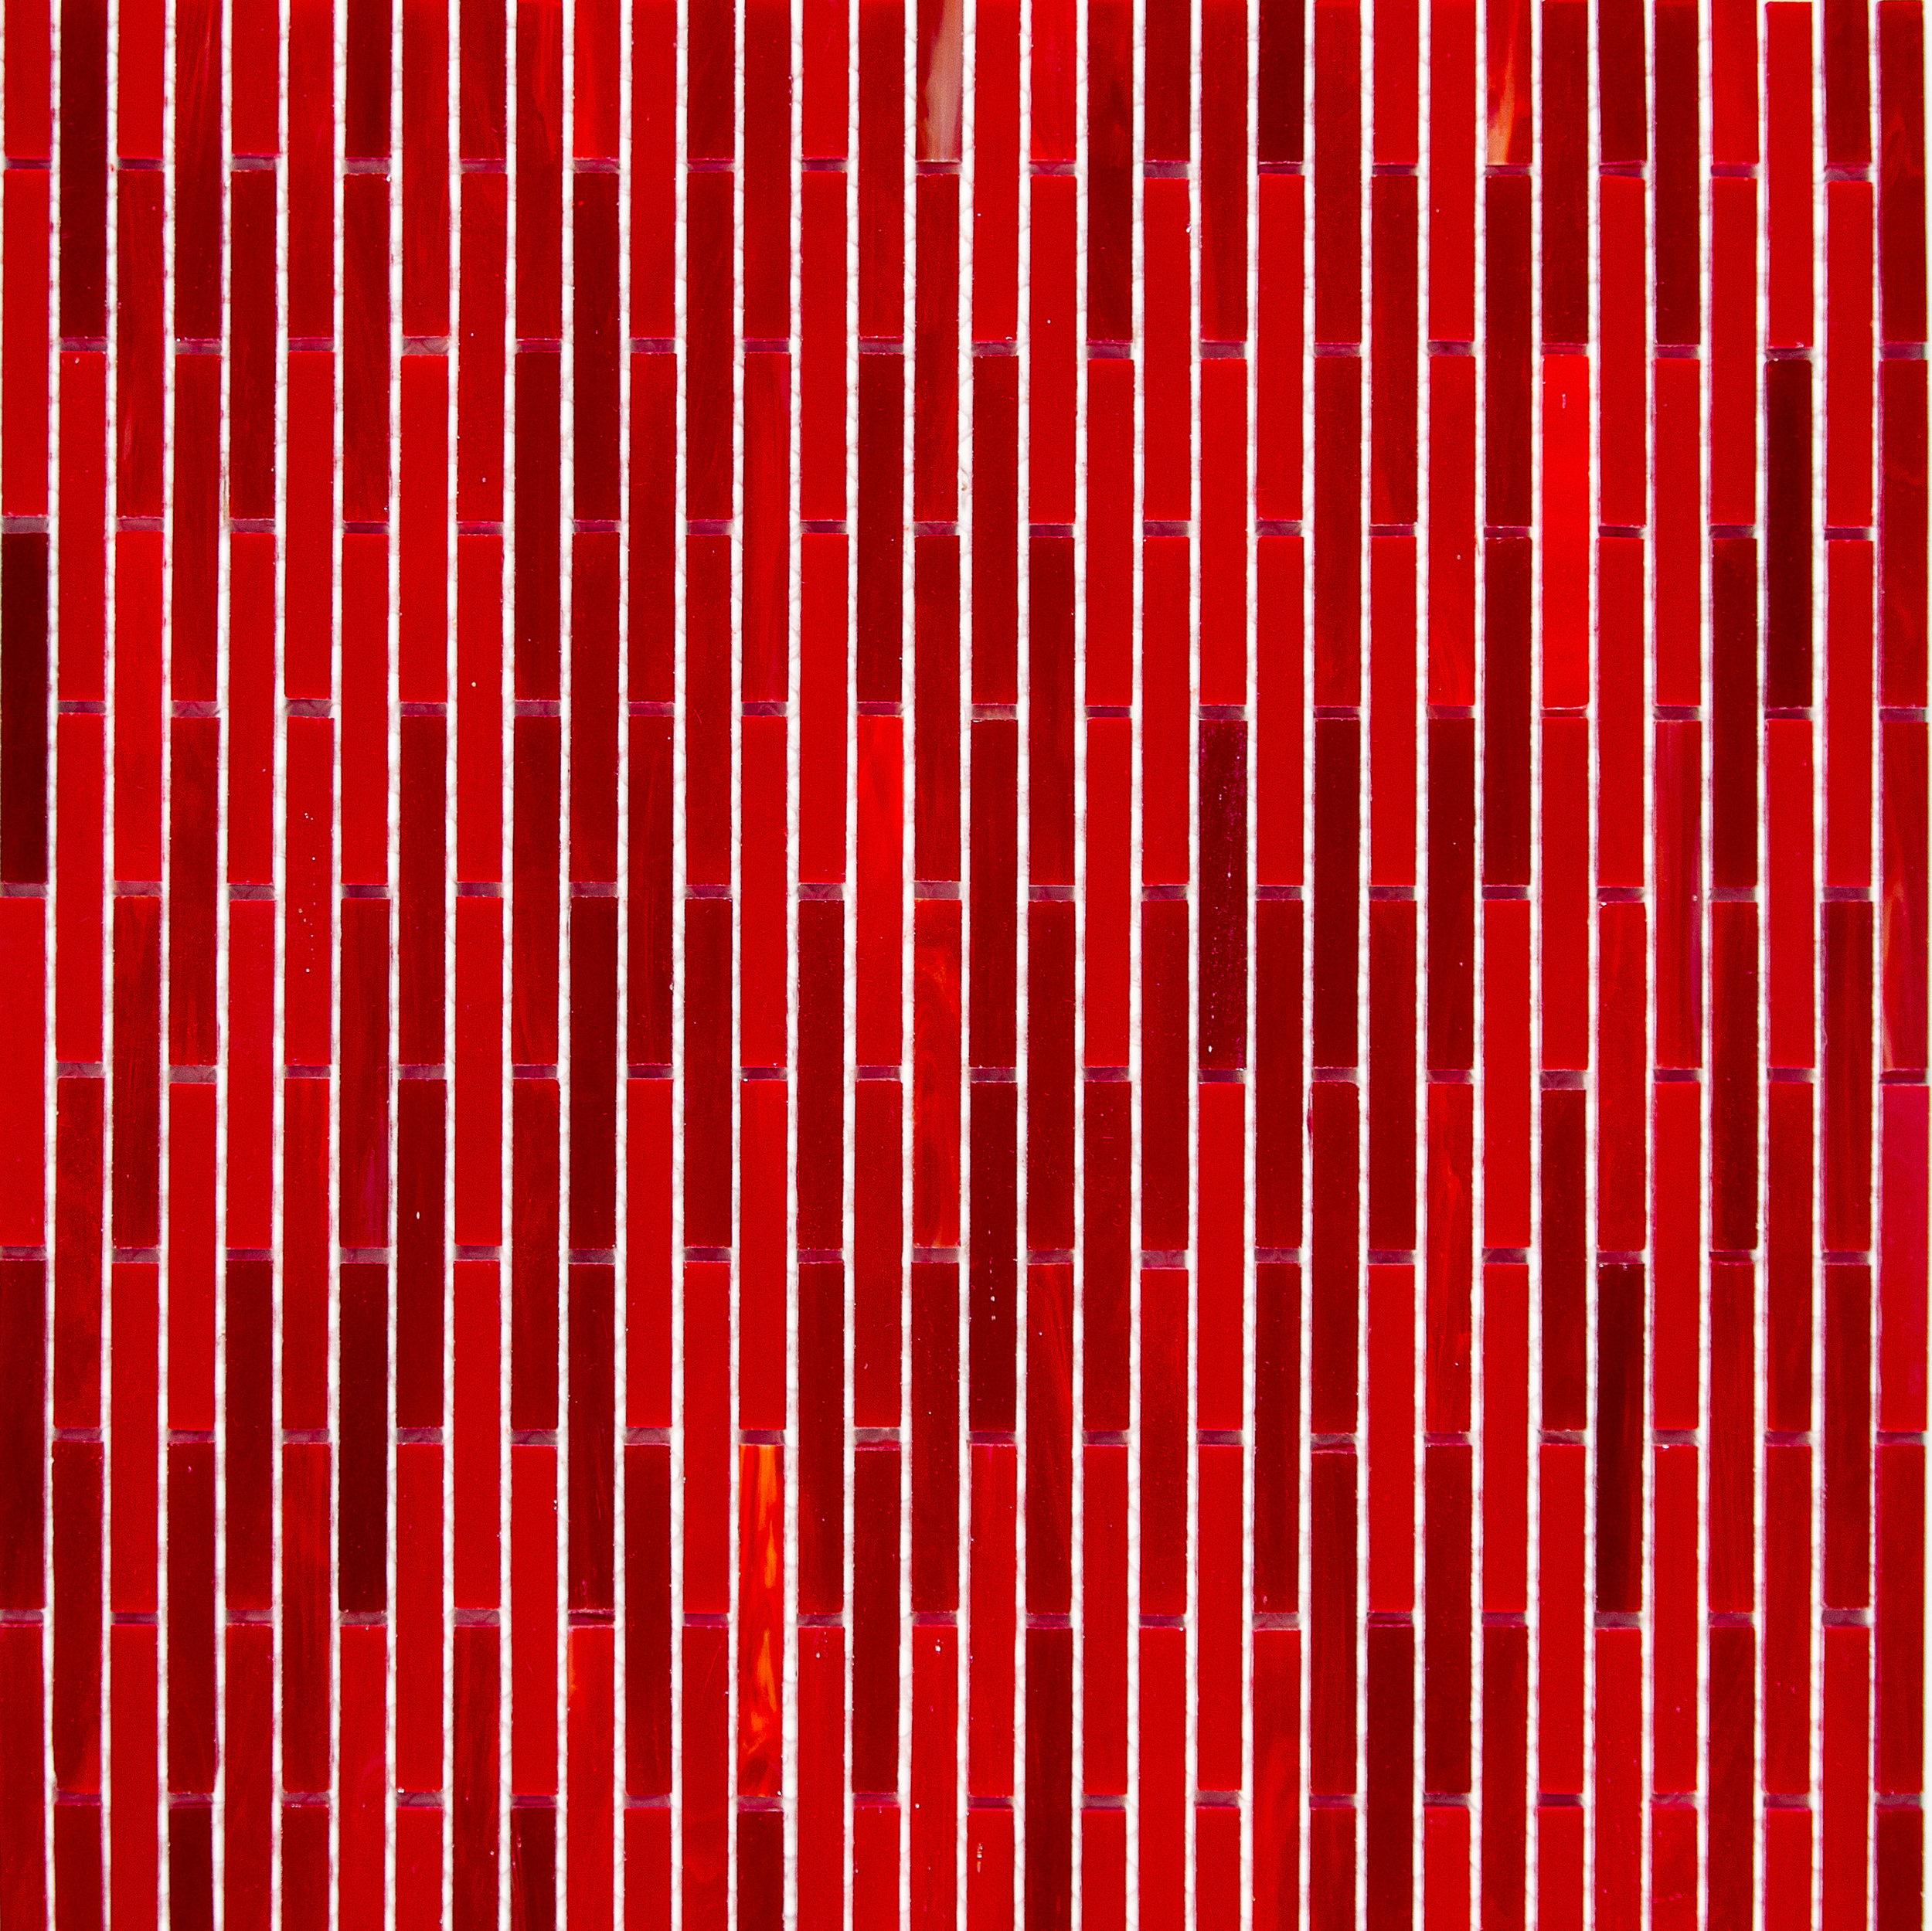 coliseum red matchstick